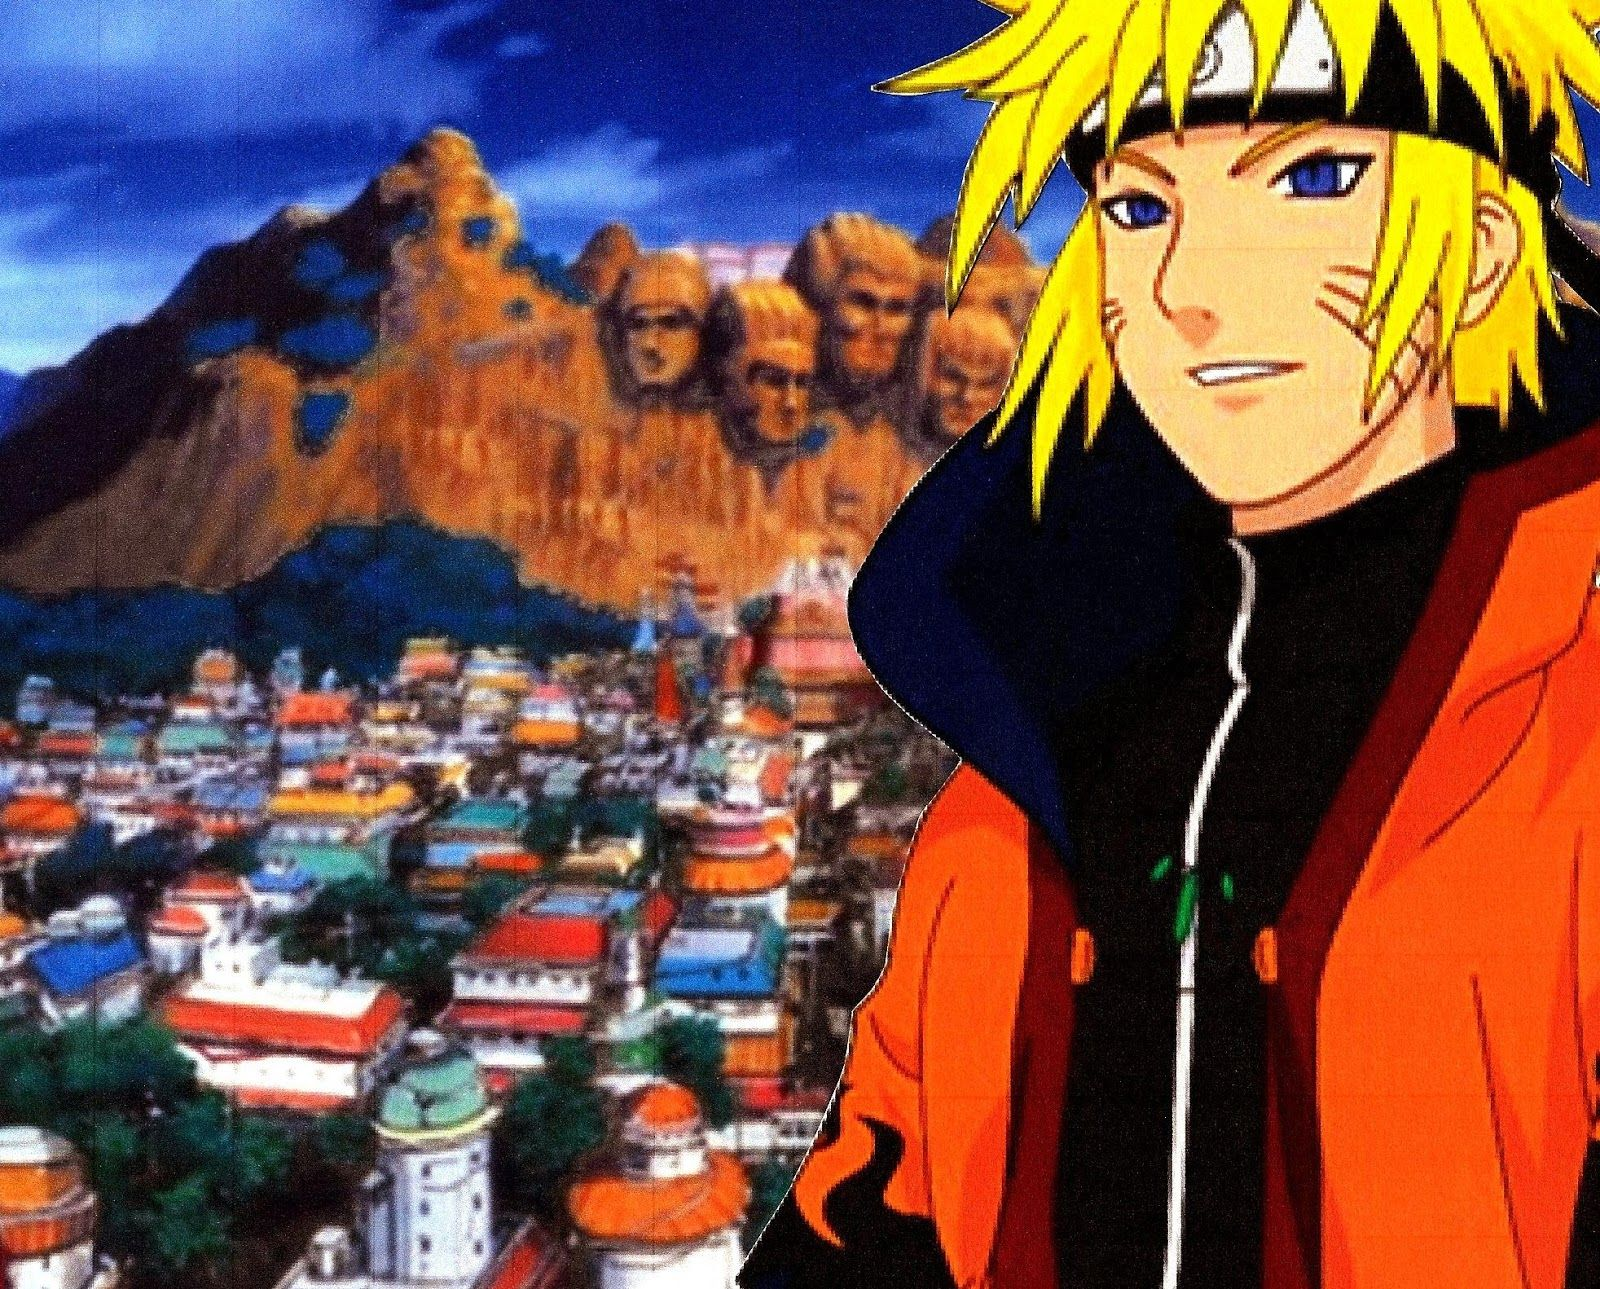 Kumpulan Gambar Naruto Terbaru 2016 Gambar Lucu Terbaru Cartoon Animation Pictures Di 2020 Naruto Gambar Lucu Gambar